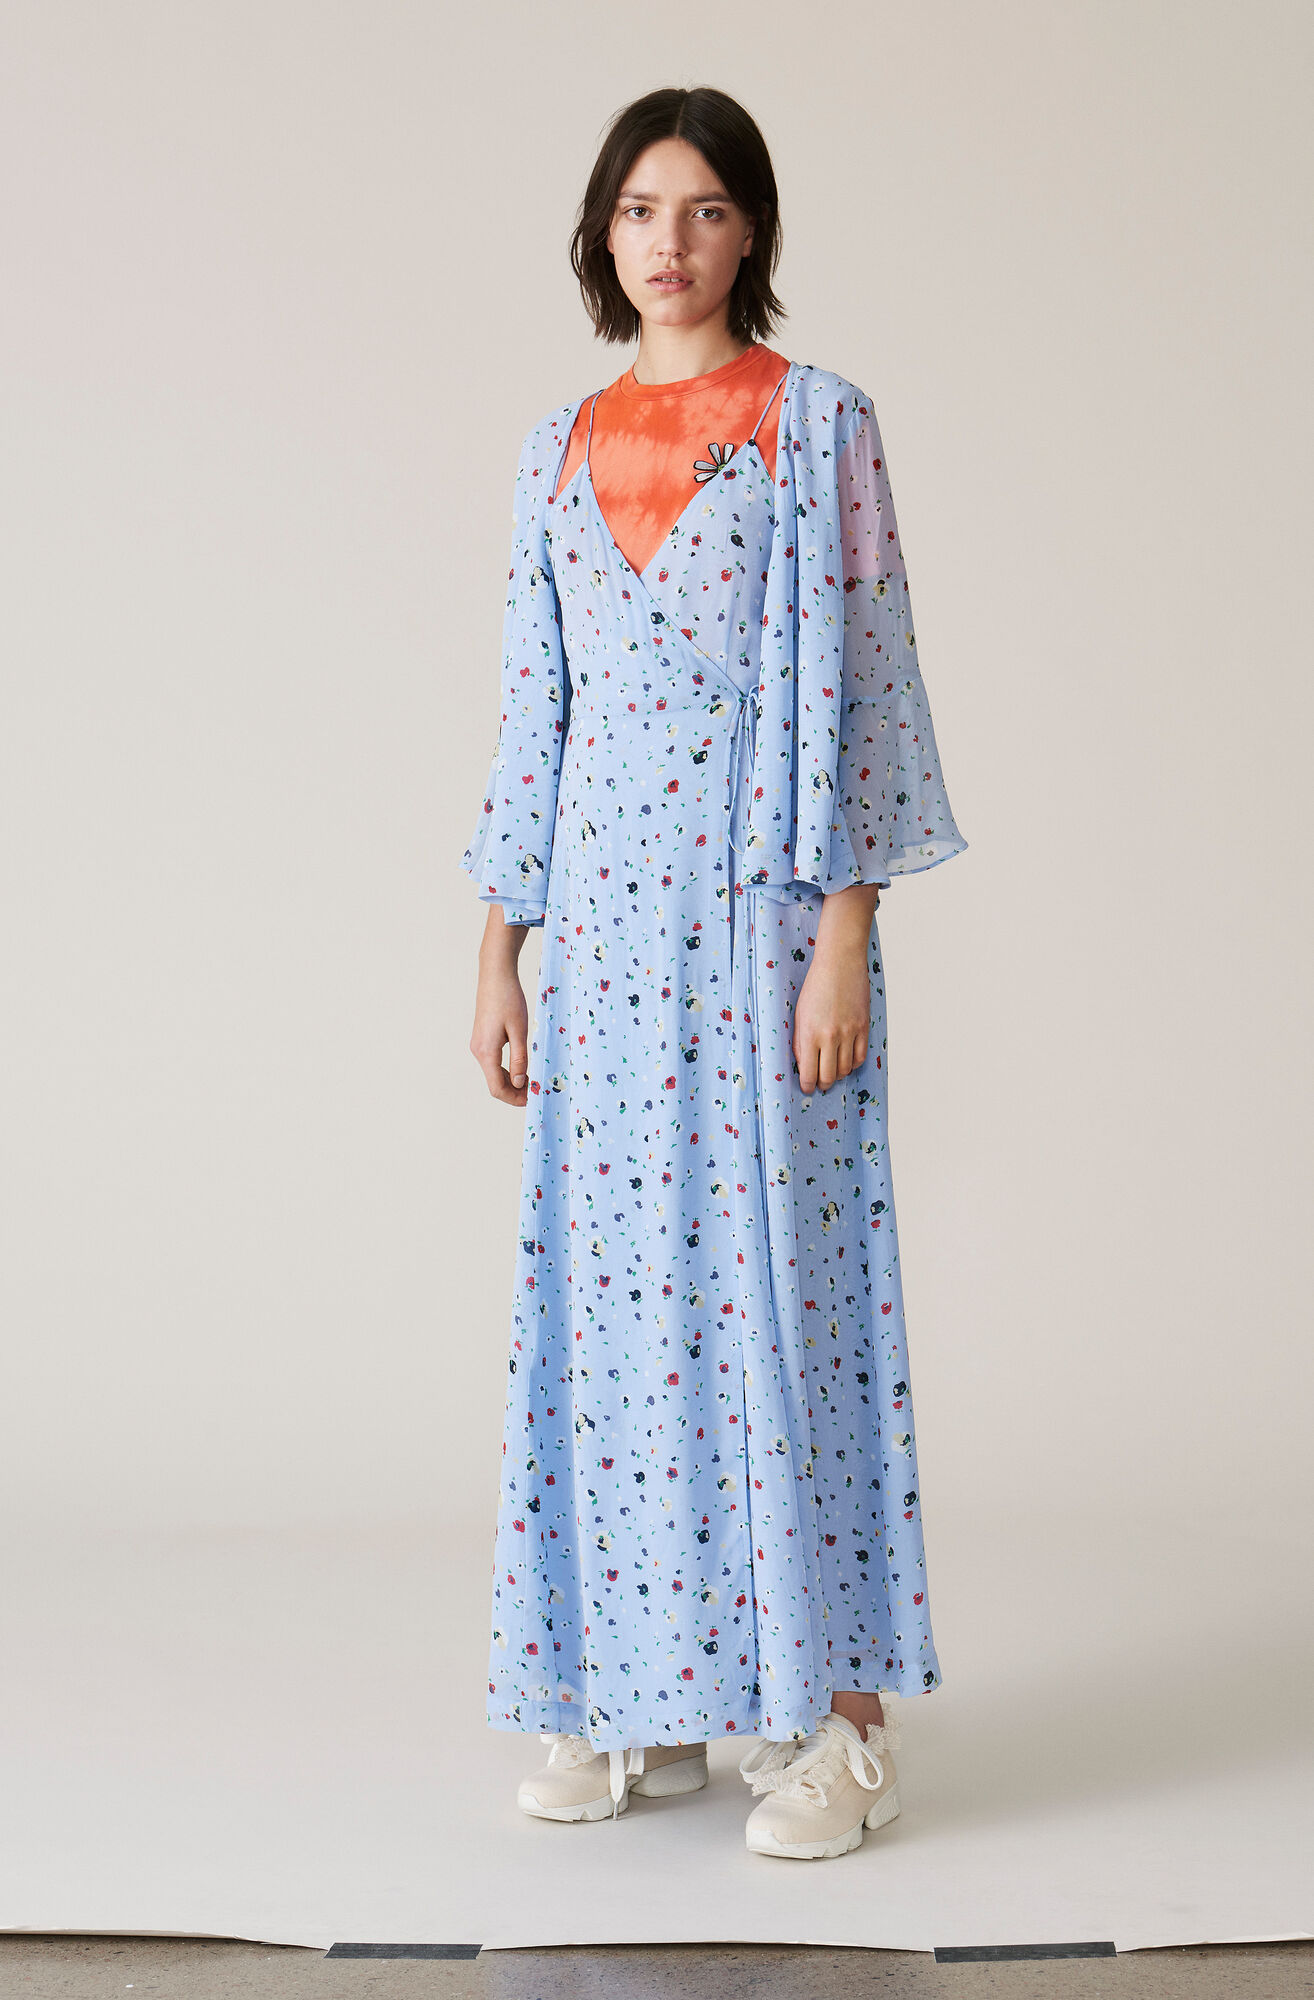 Dainty Georgette Strap Dress, Serenity Blue, hi-res